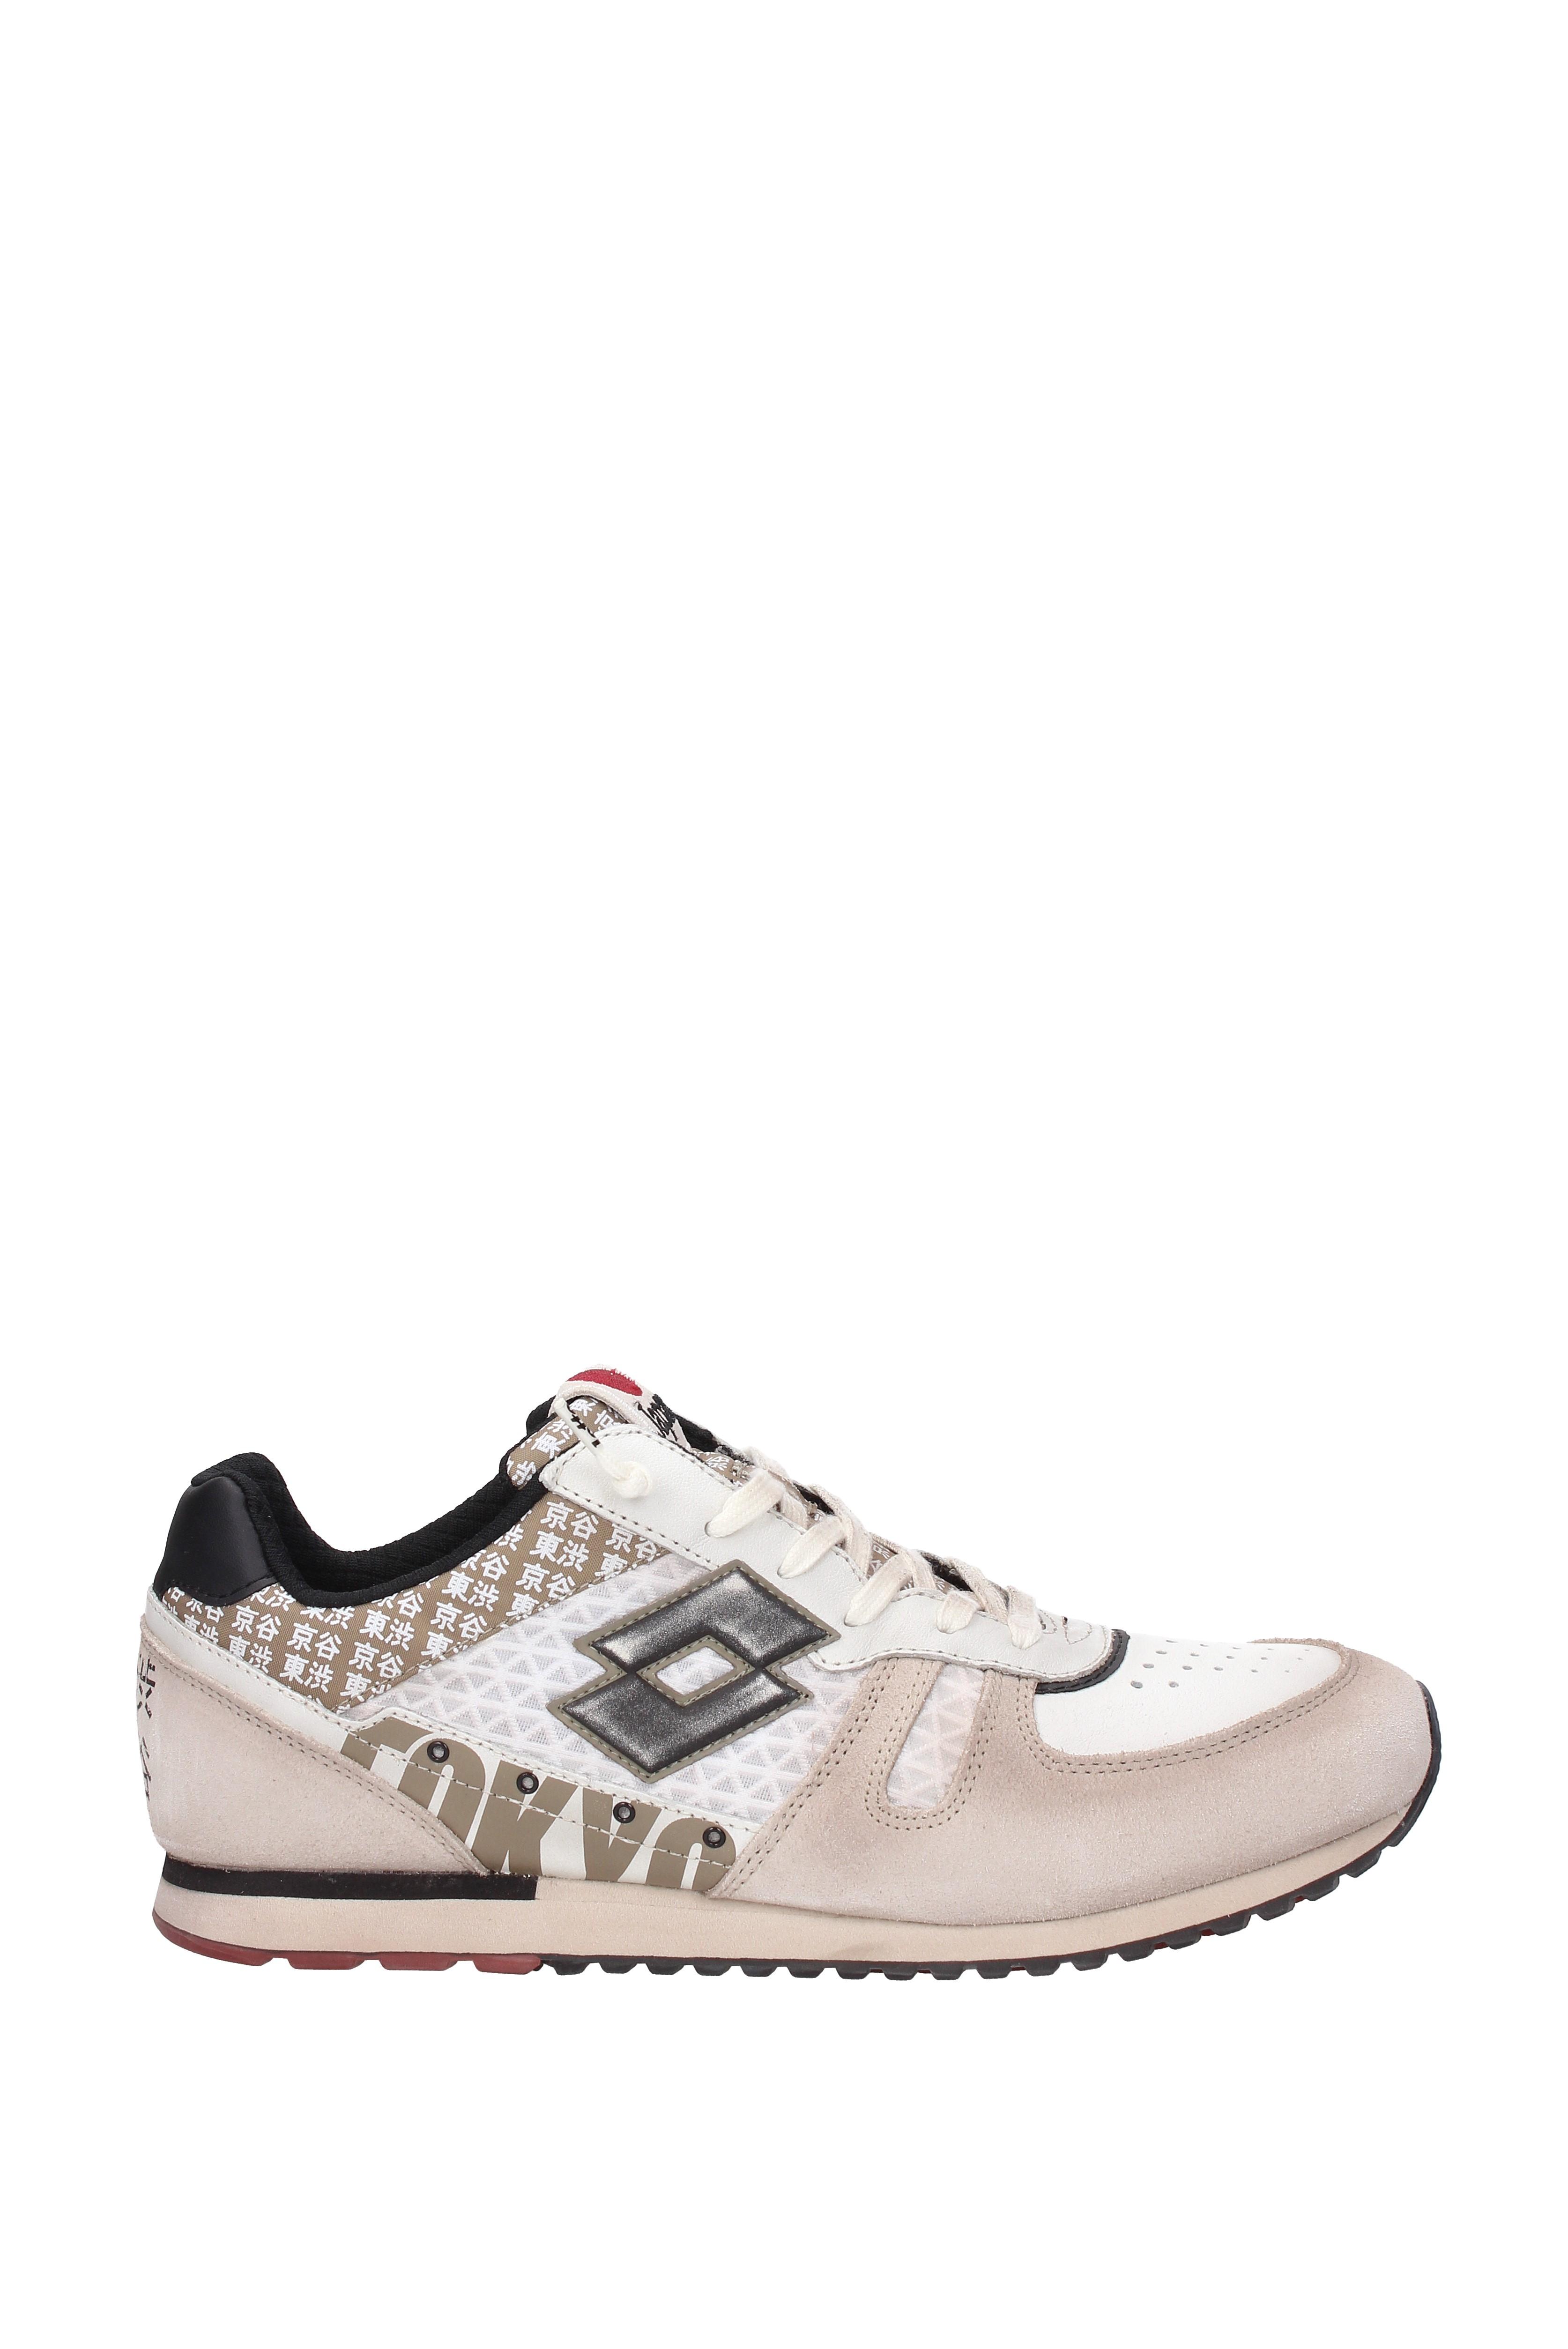 Sneakers Lotto Herren tokio shibuya Herren Lotto - Stoff (S0089) a2628a